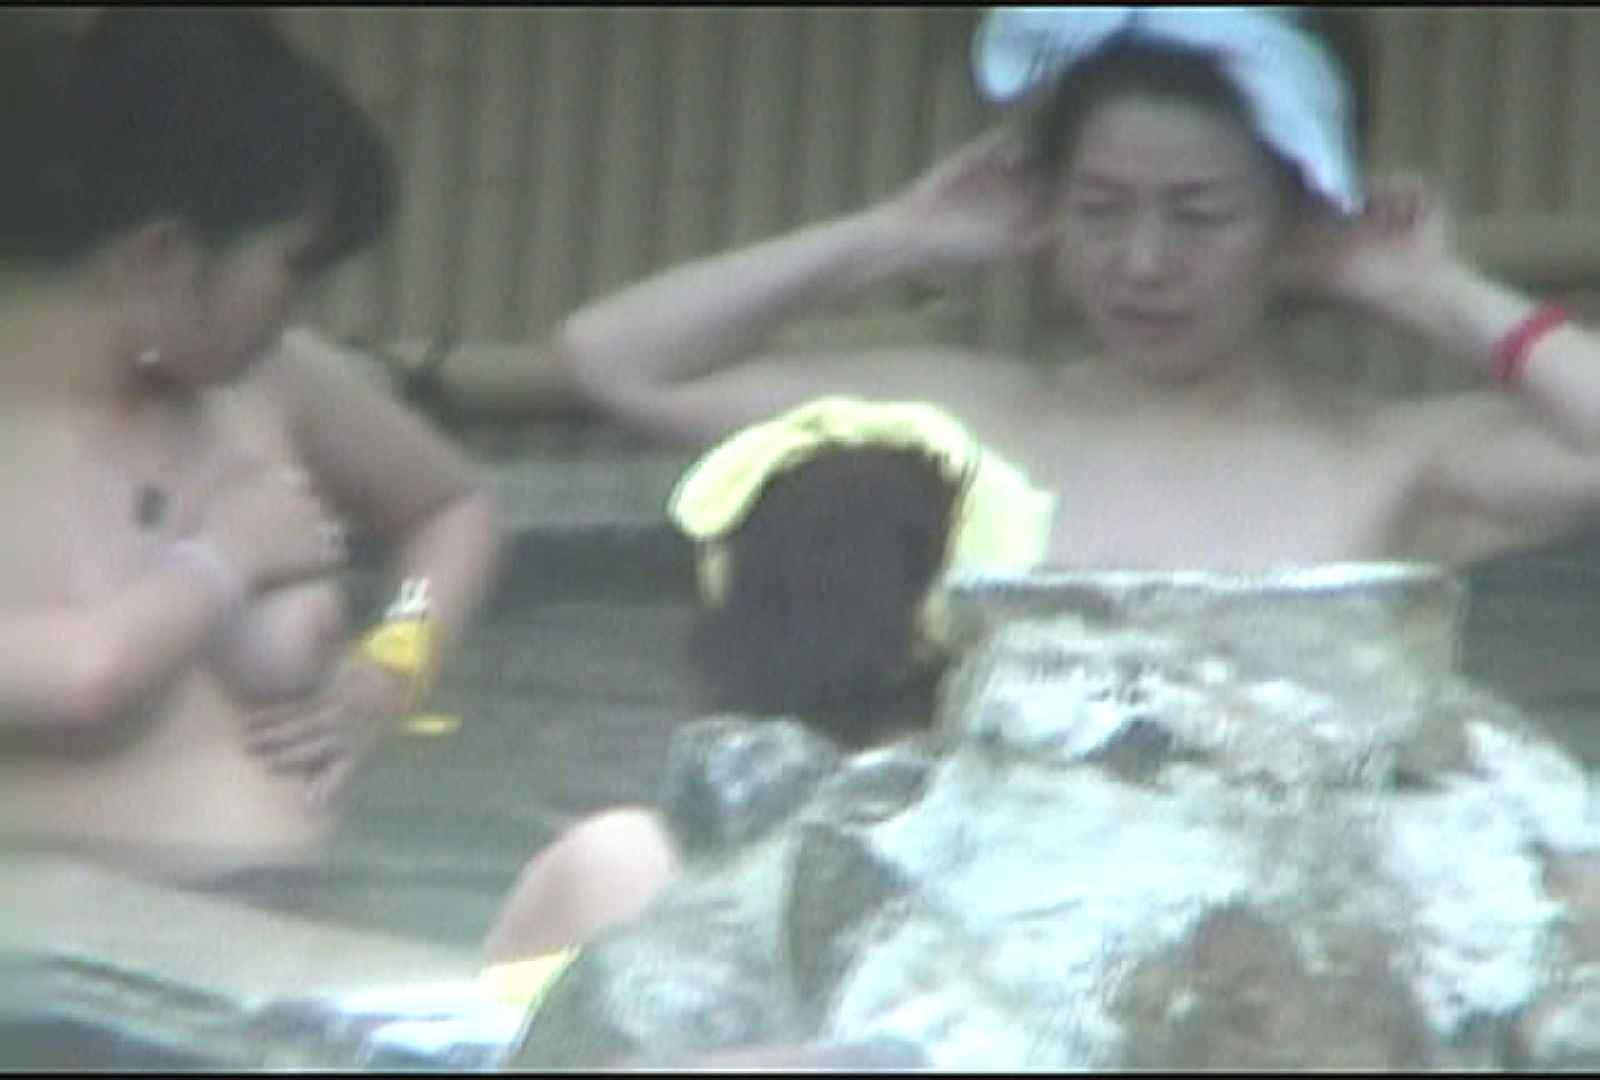 Aquaな露天風呂Vol.145 盗撮映像  78Pix 76